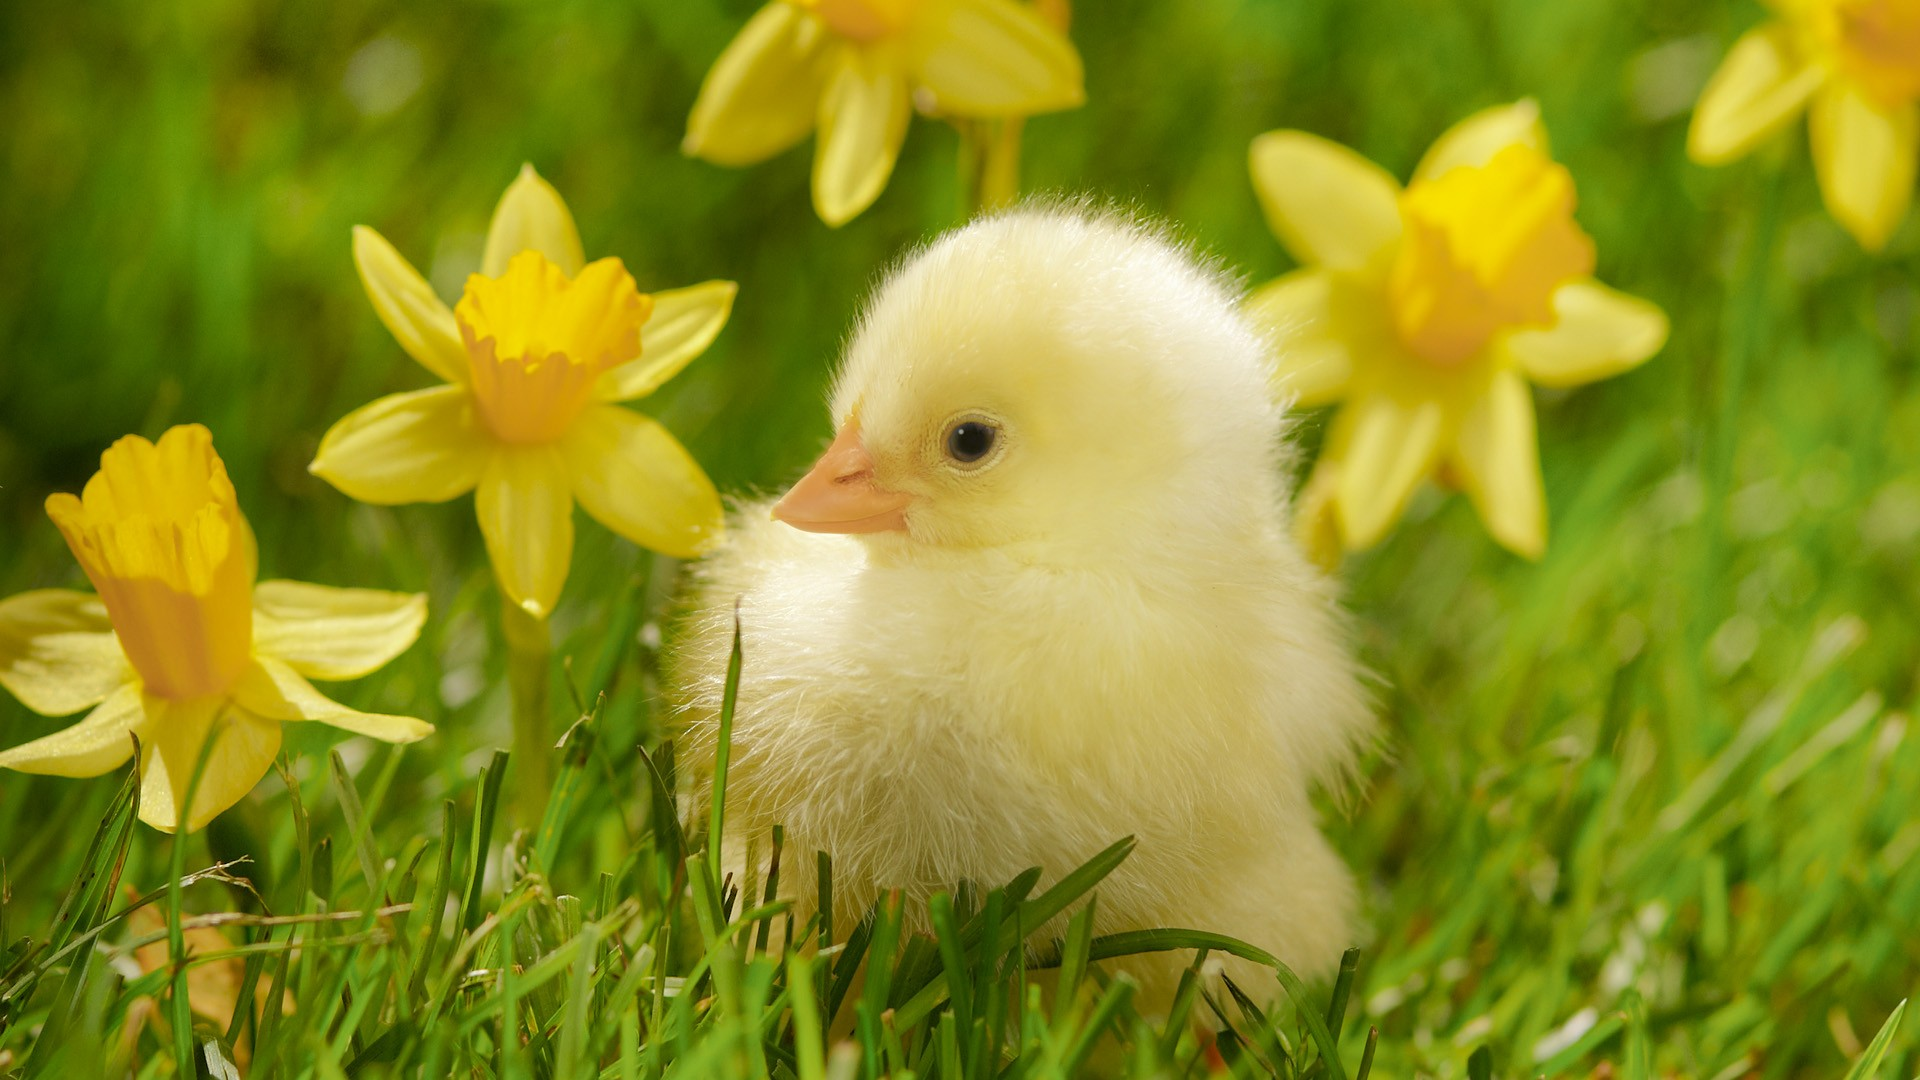 Pin Spring Daffodils Wallpaper 1920x1080 1920x1080